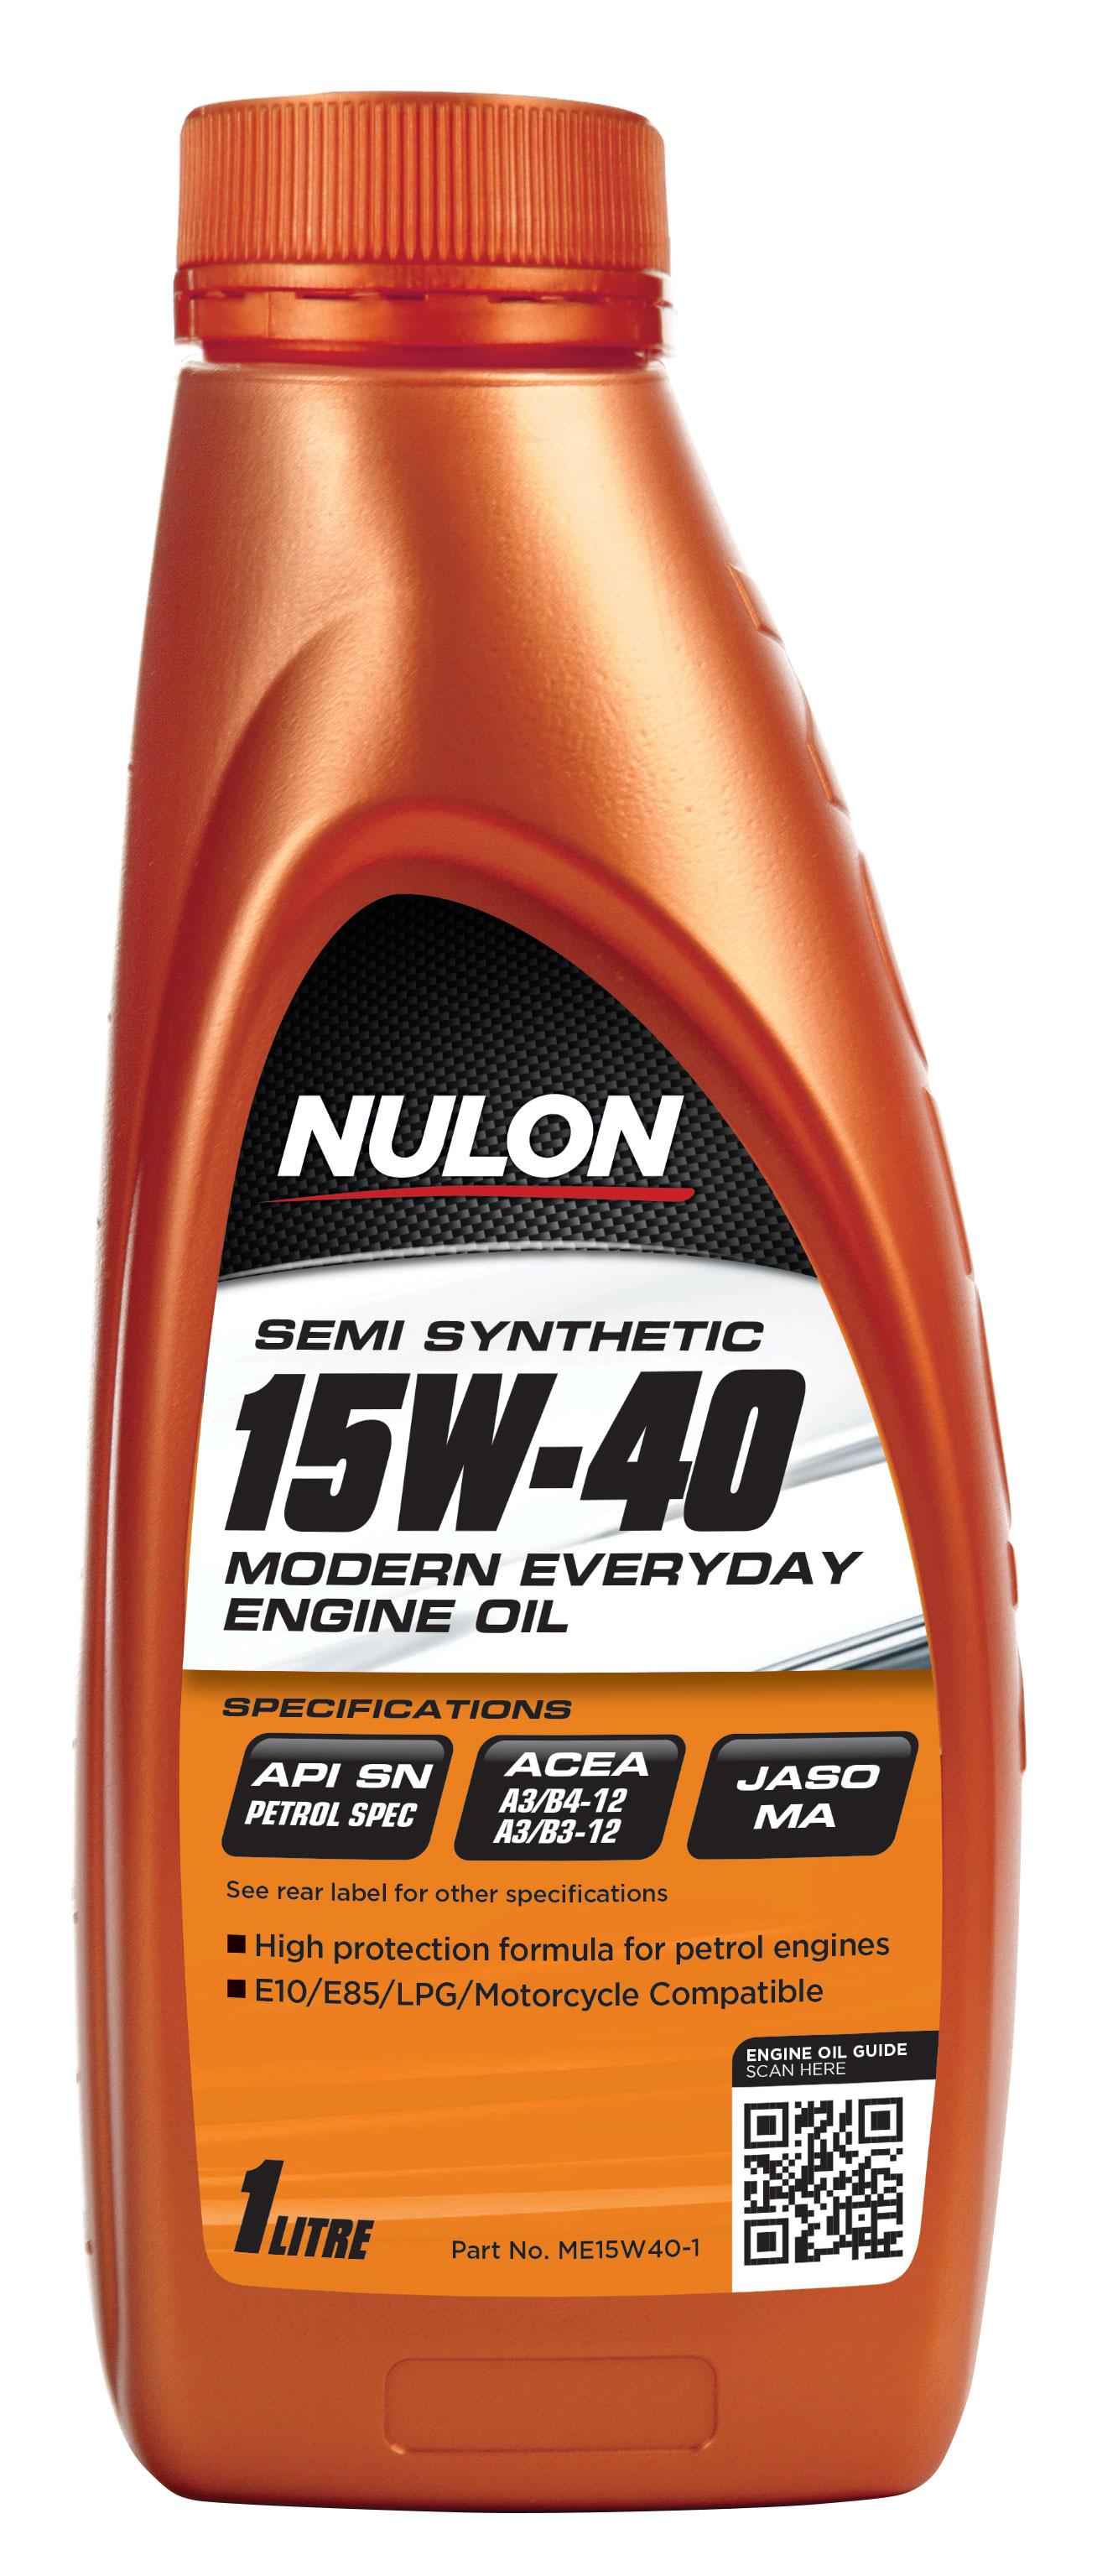 Nulon Semi Synthetic 15w40 Modern Everyday Engine Oil 1l